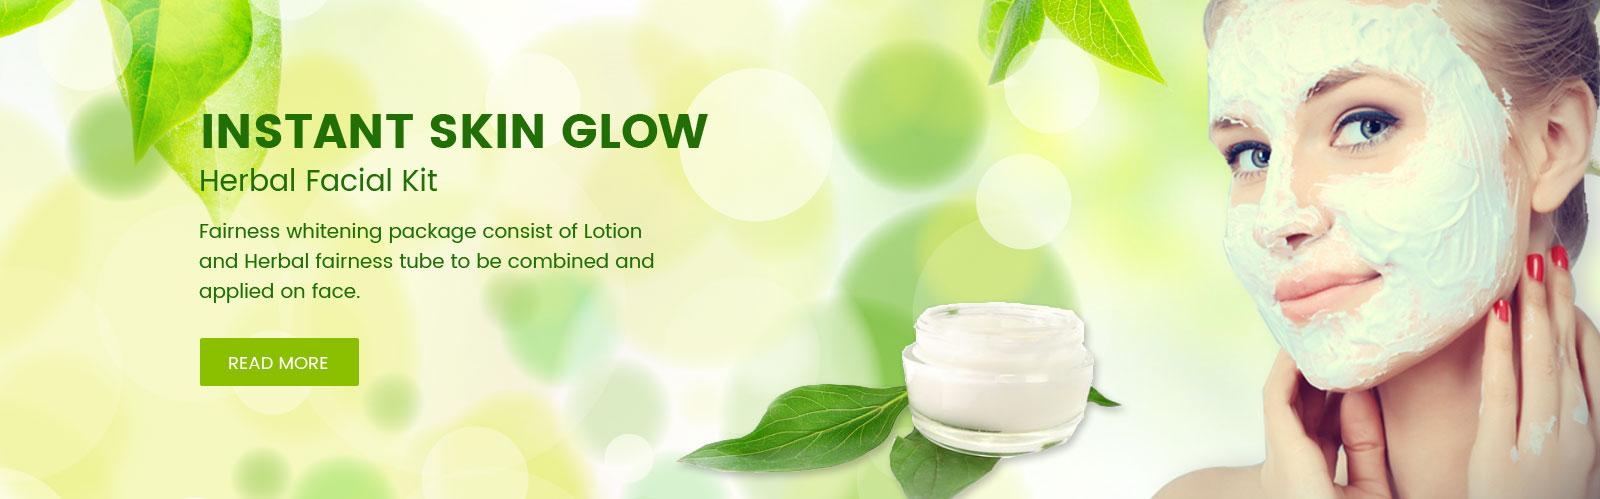 Instant Skin Glow Herbal Facial Kit